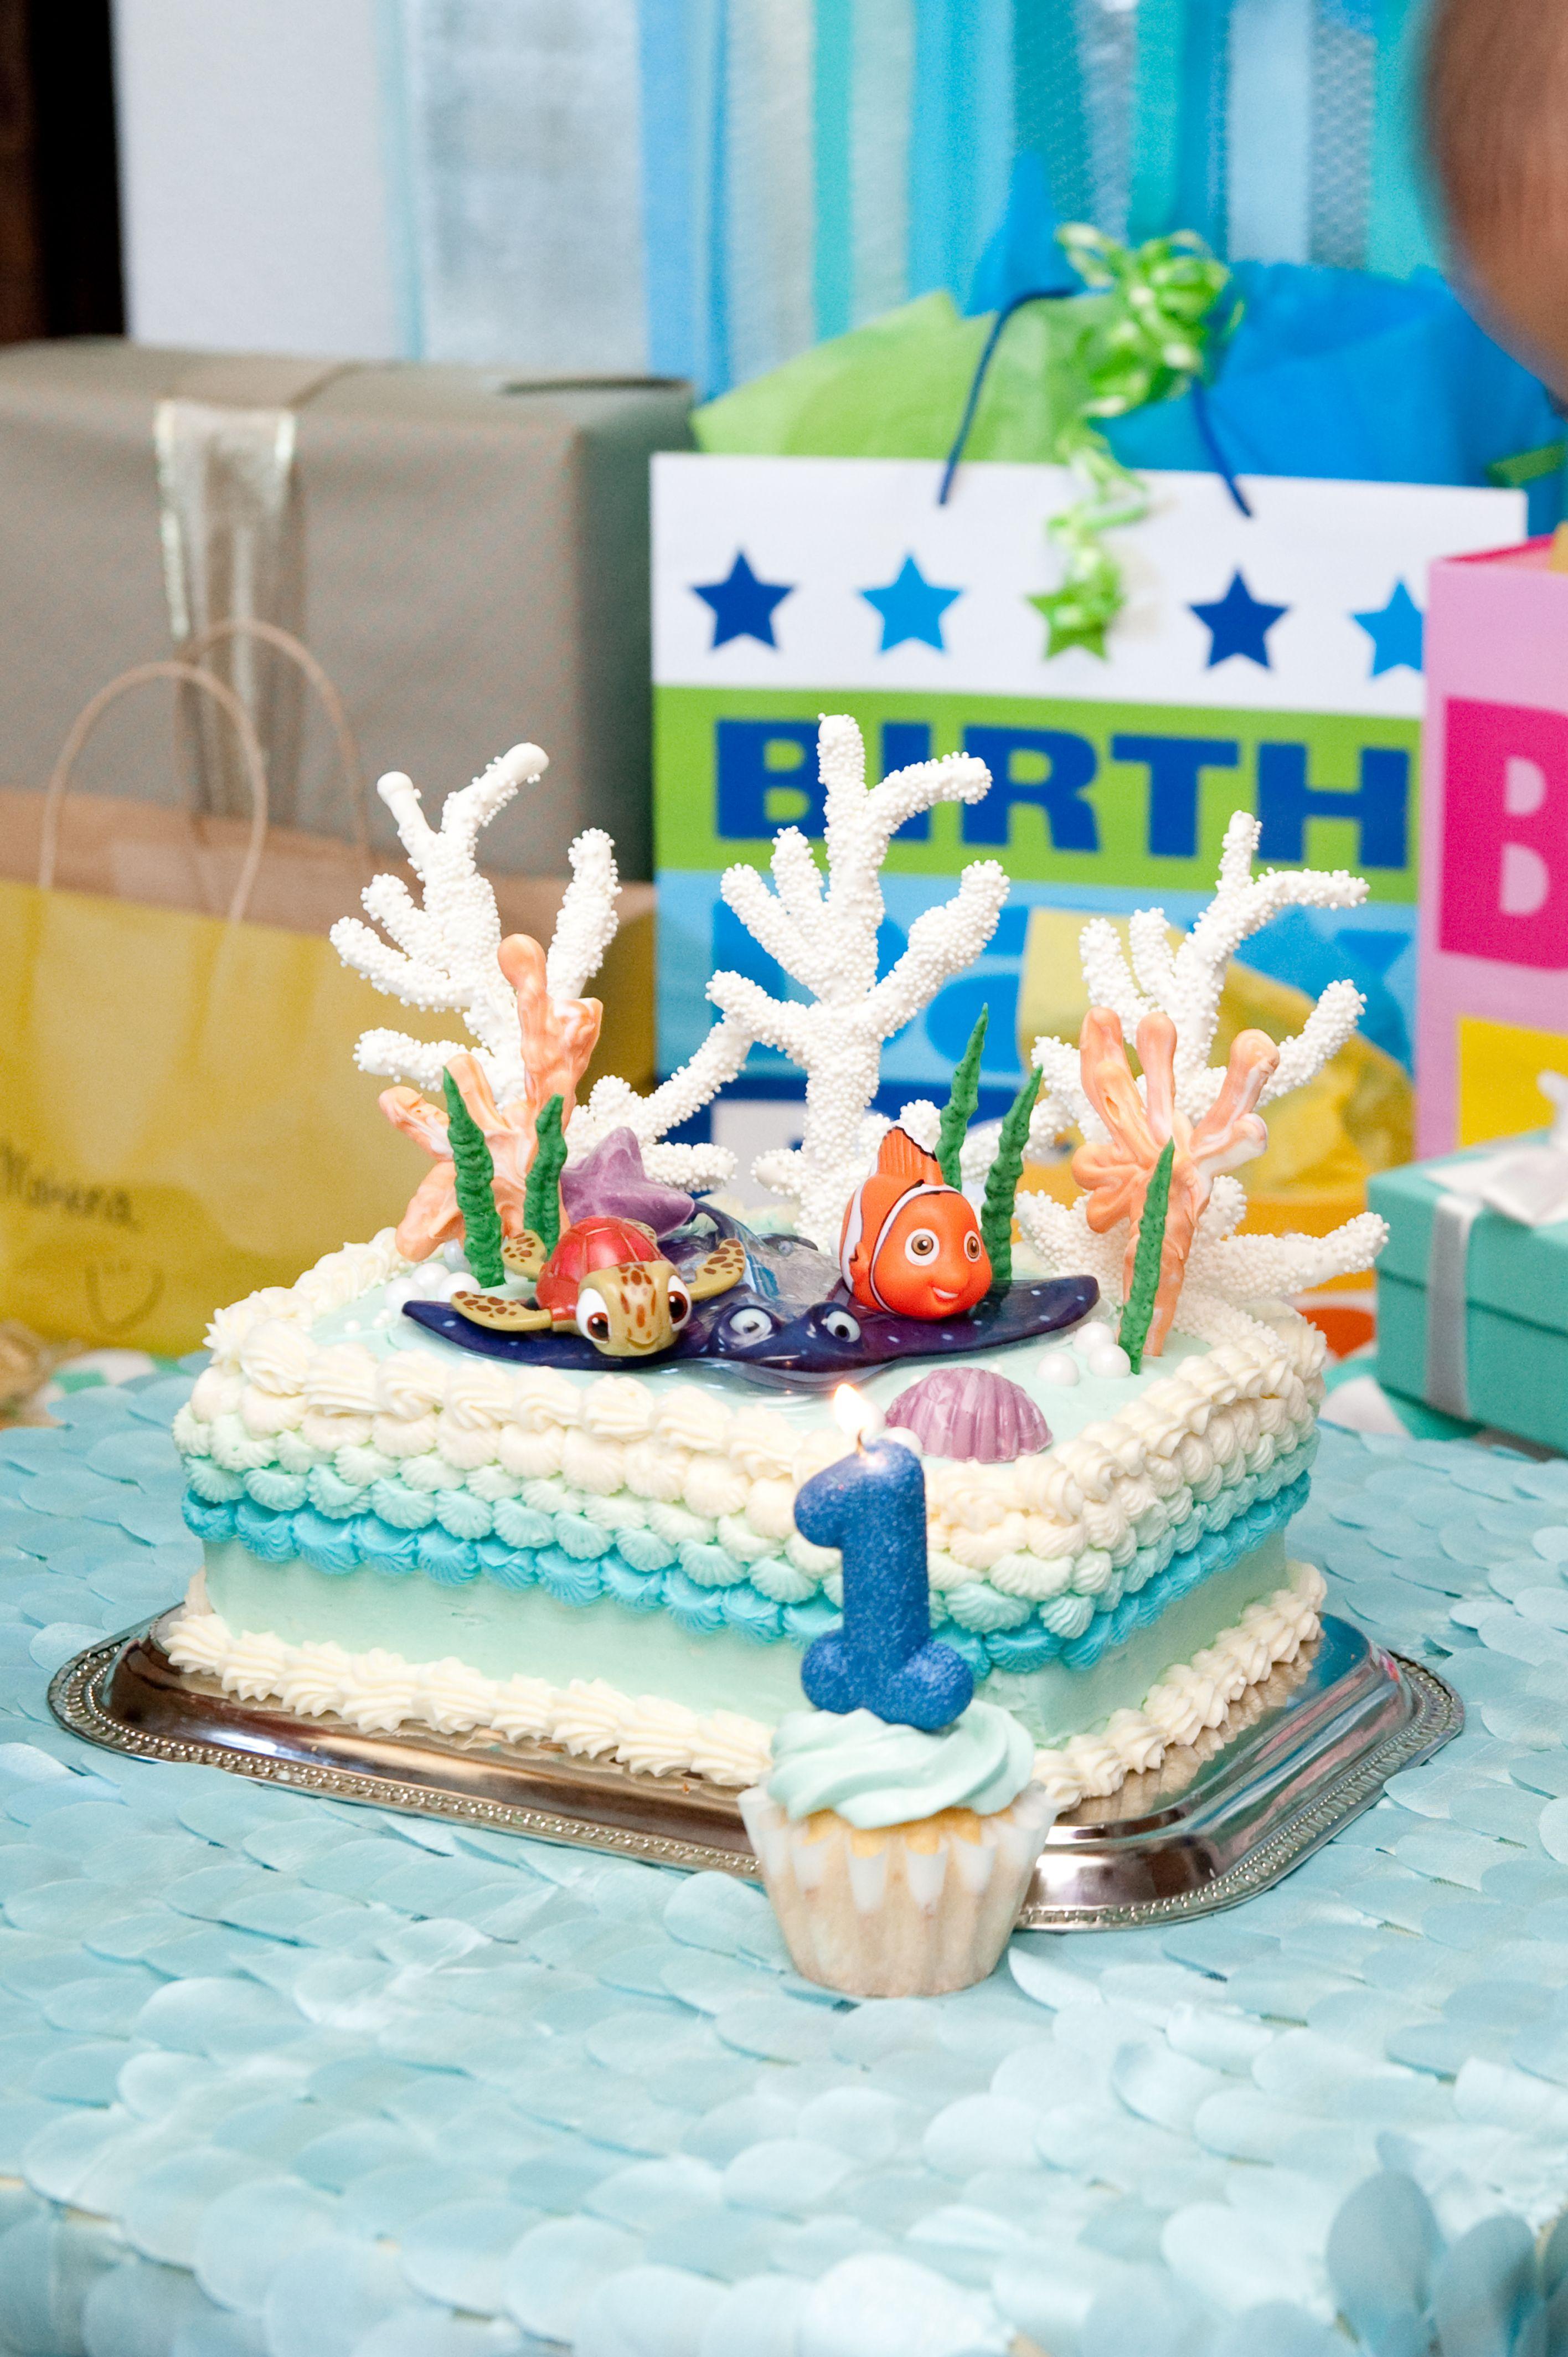 Finding nemo birthday party cake smash cake with white